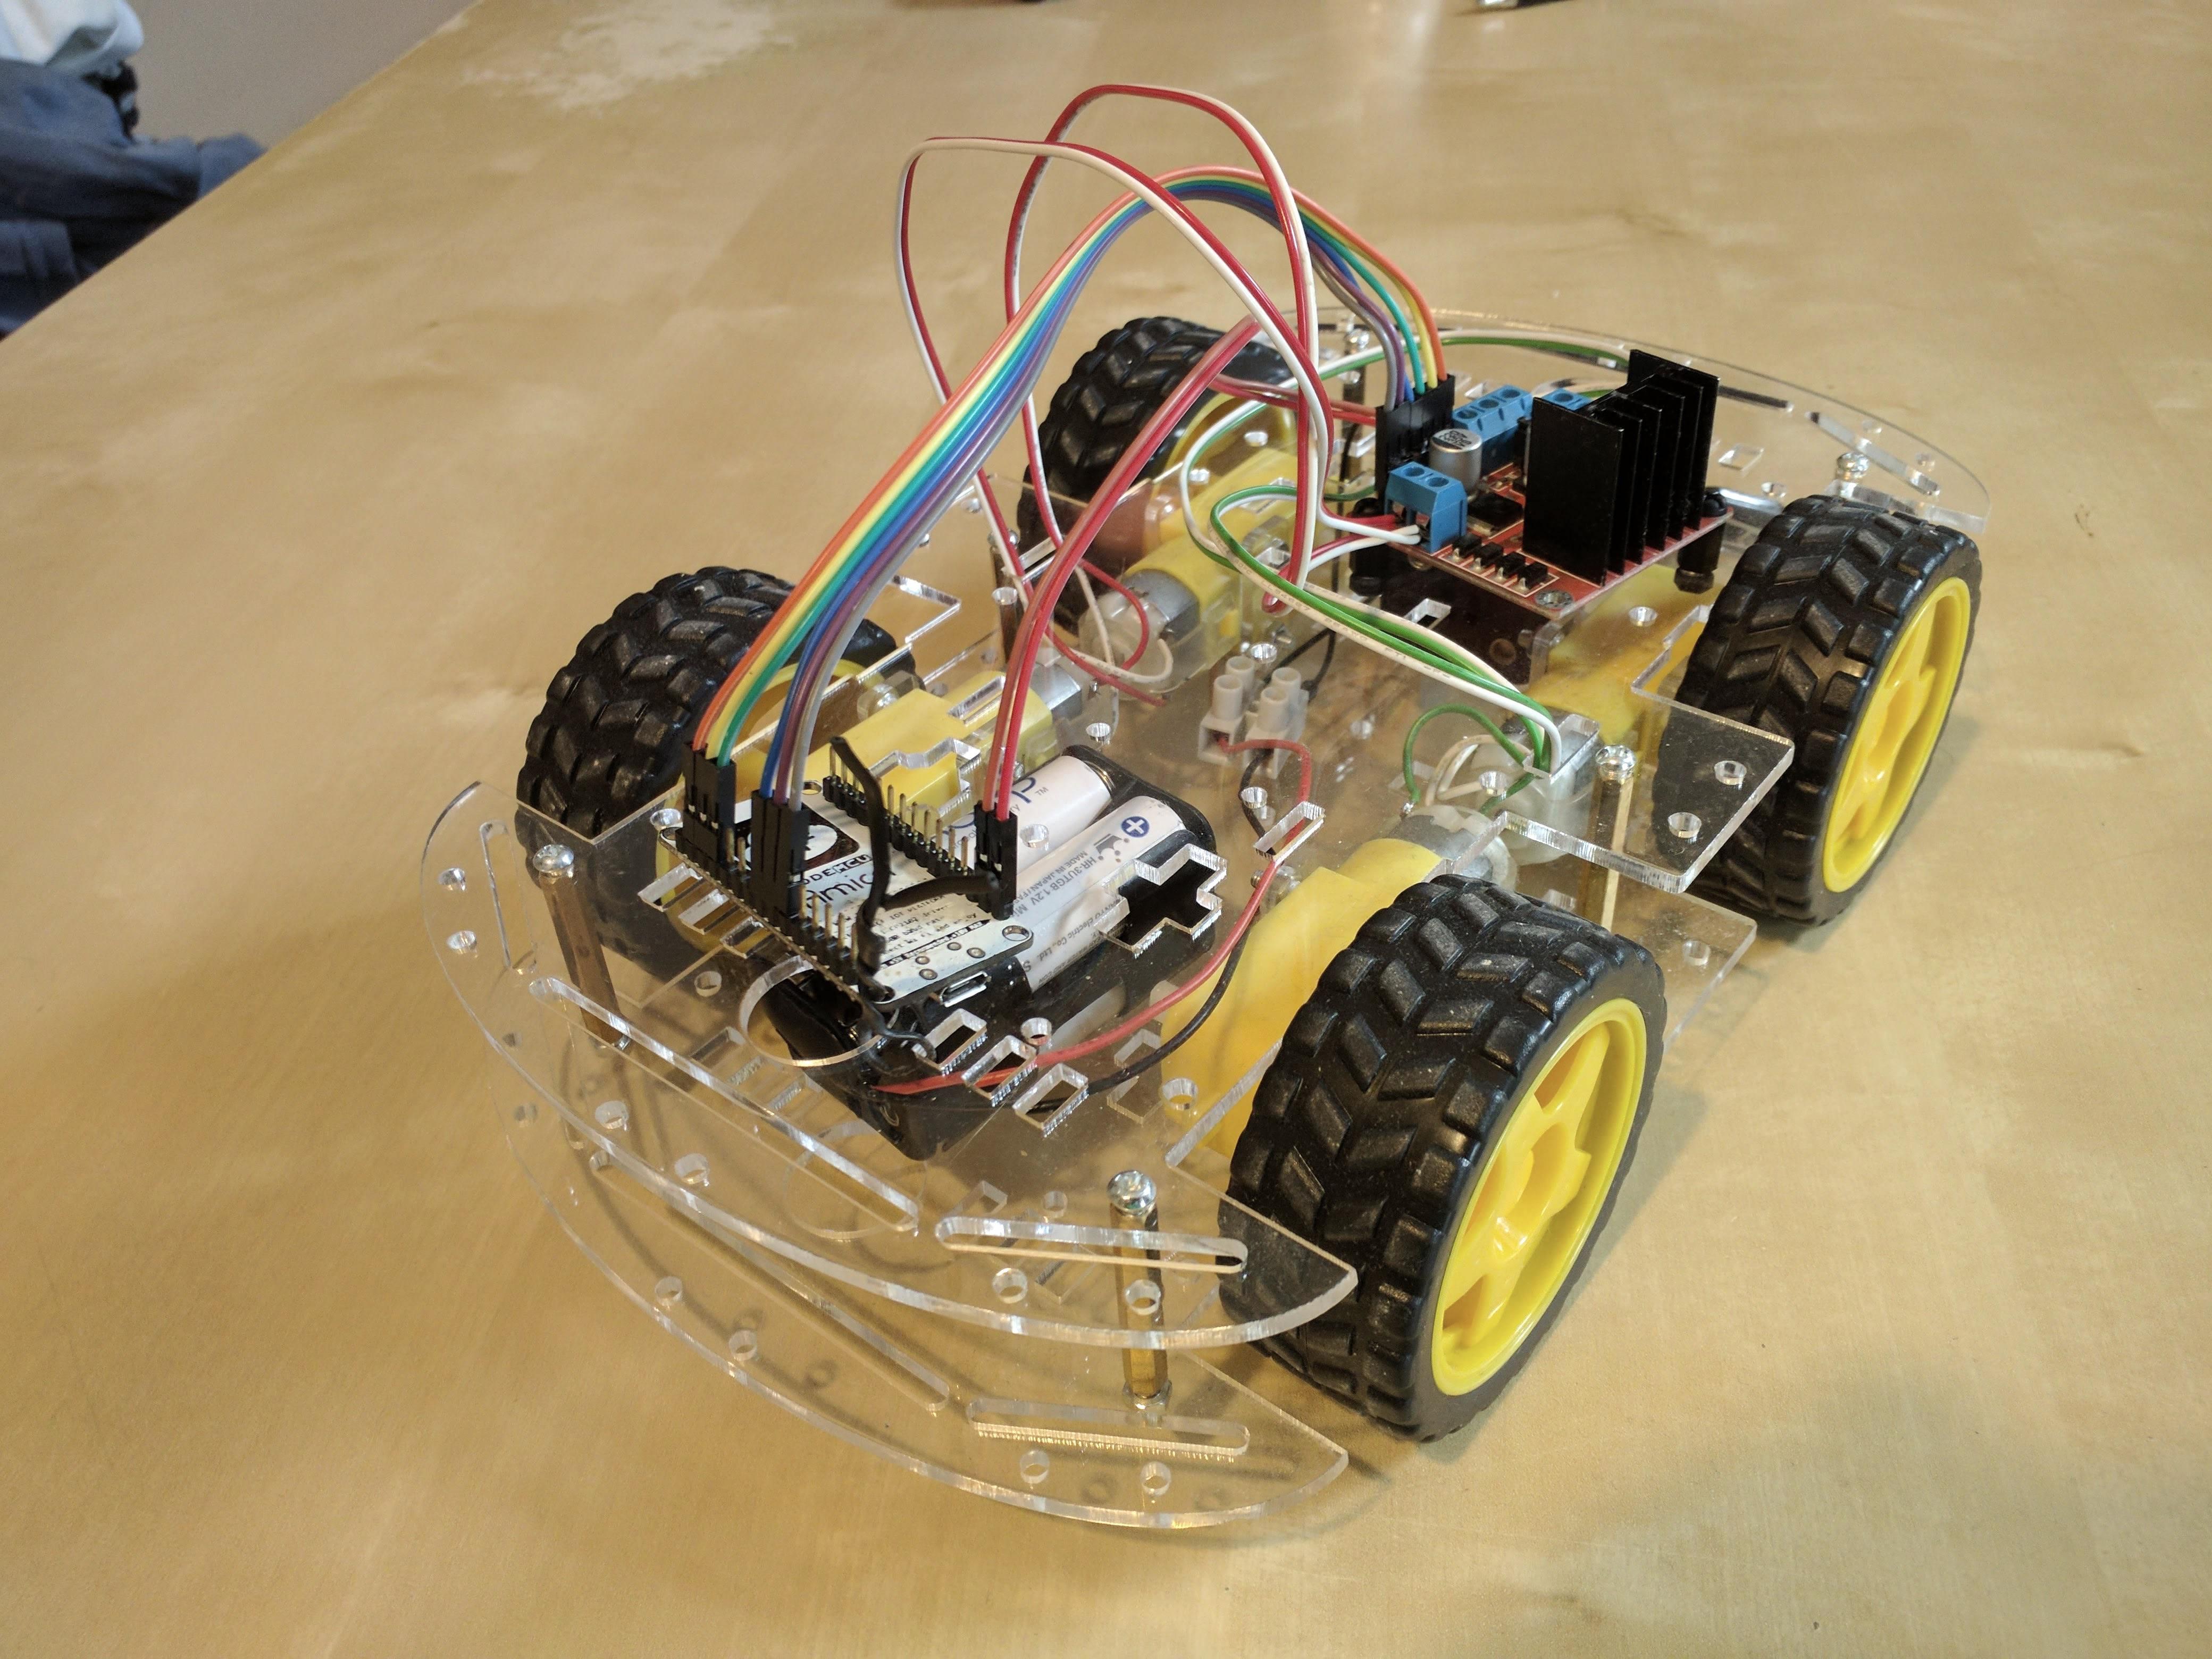 GitHub - Reinbert/ros_diffdrive_robot: Arduino code to control a